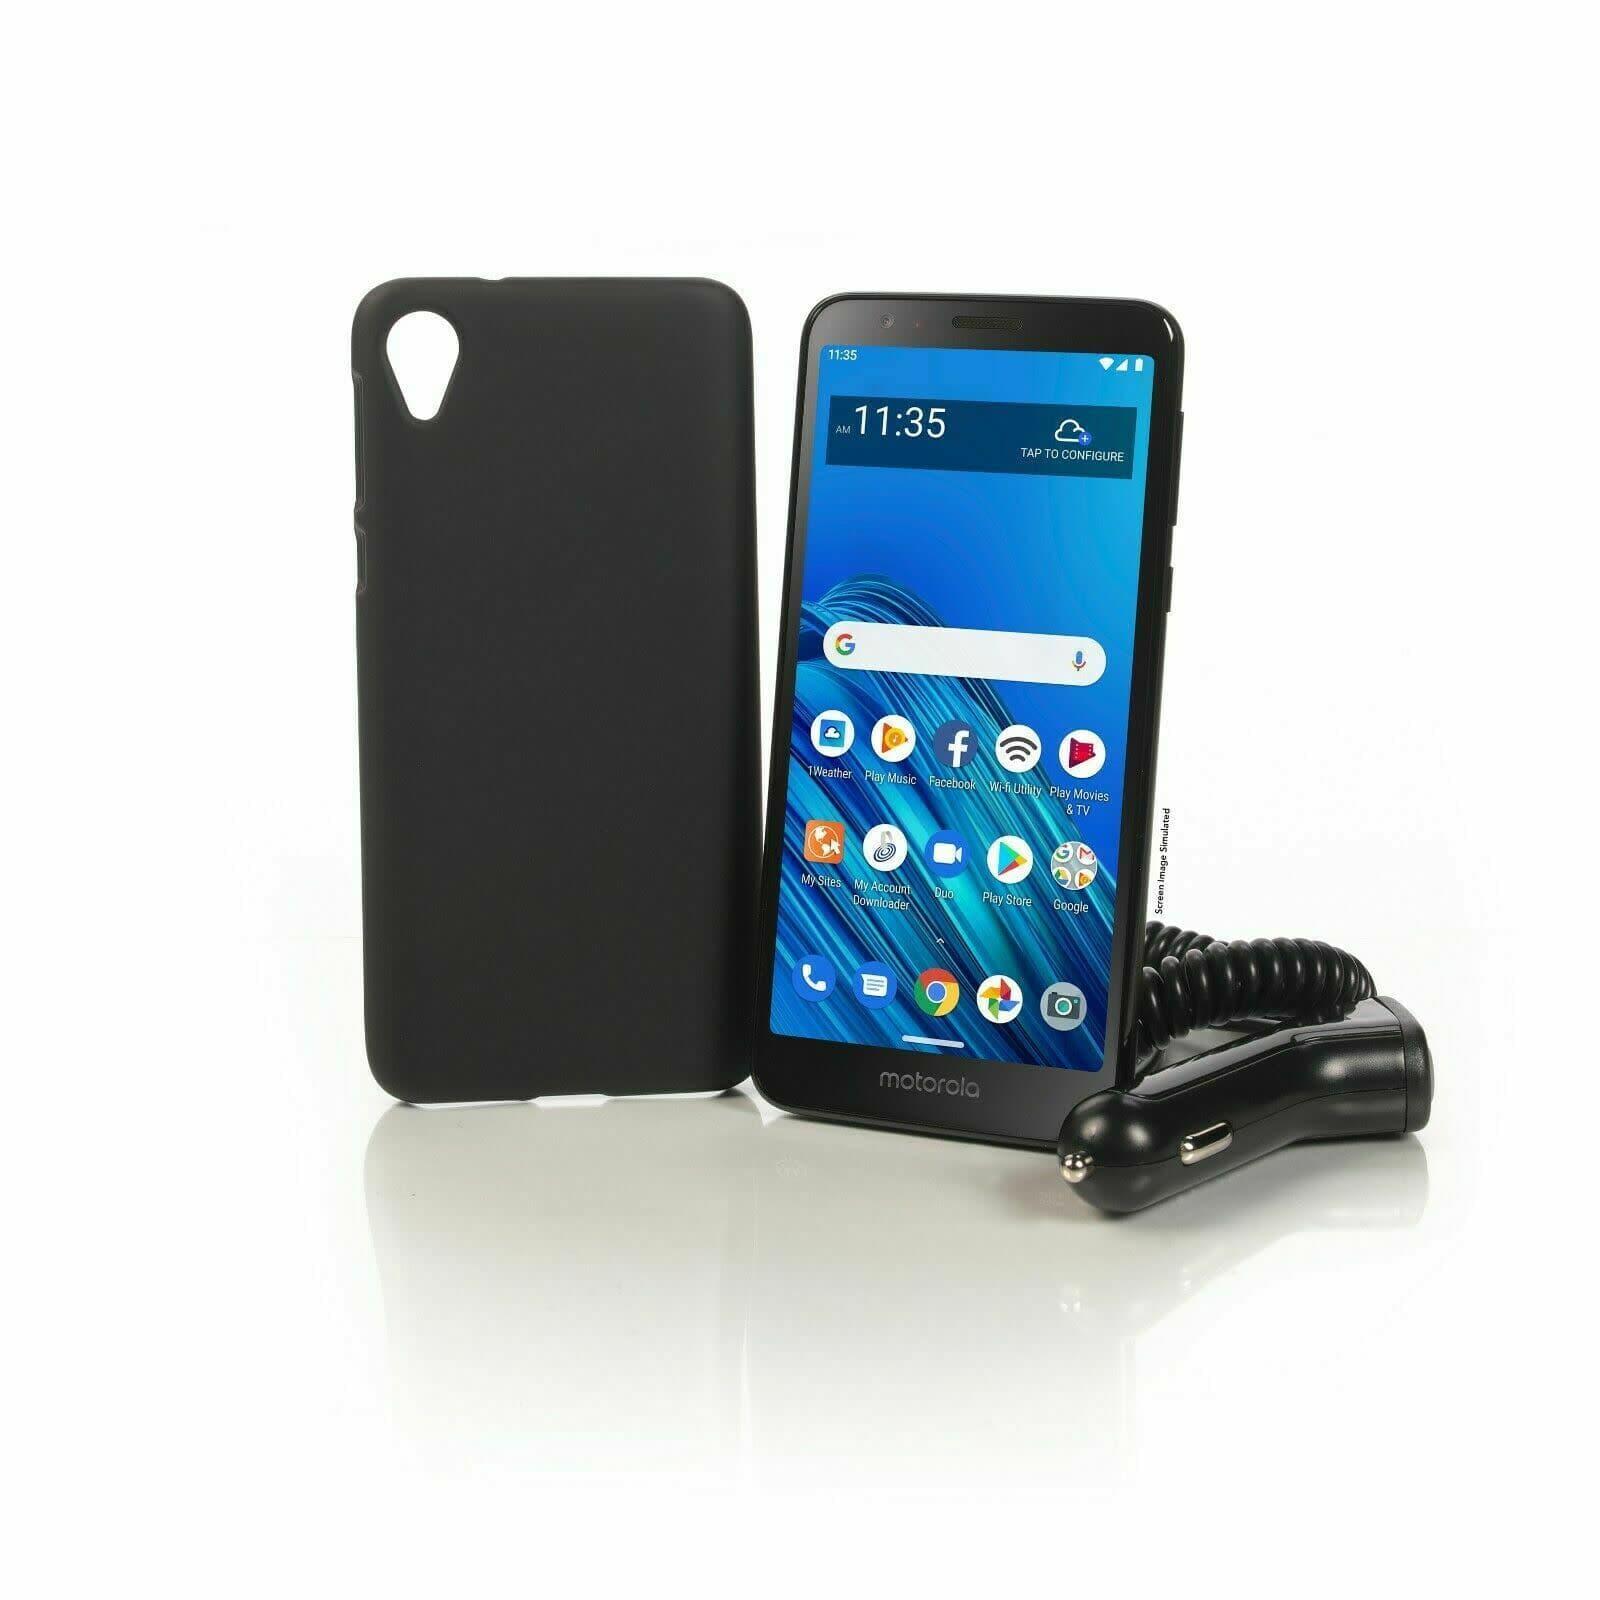 Motorola Moto e6 16GB Android Phone for Tracfone w/ 1yr Service